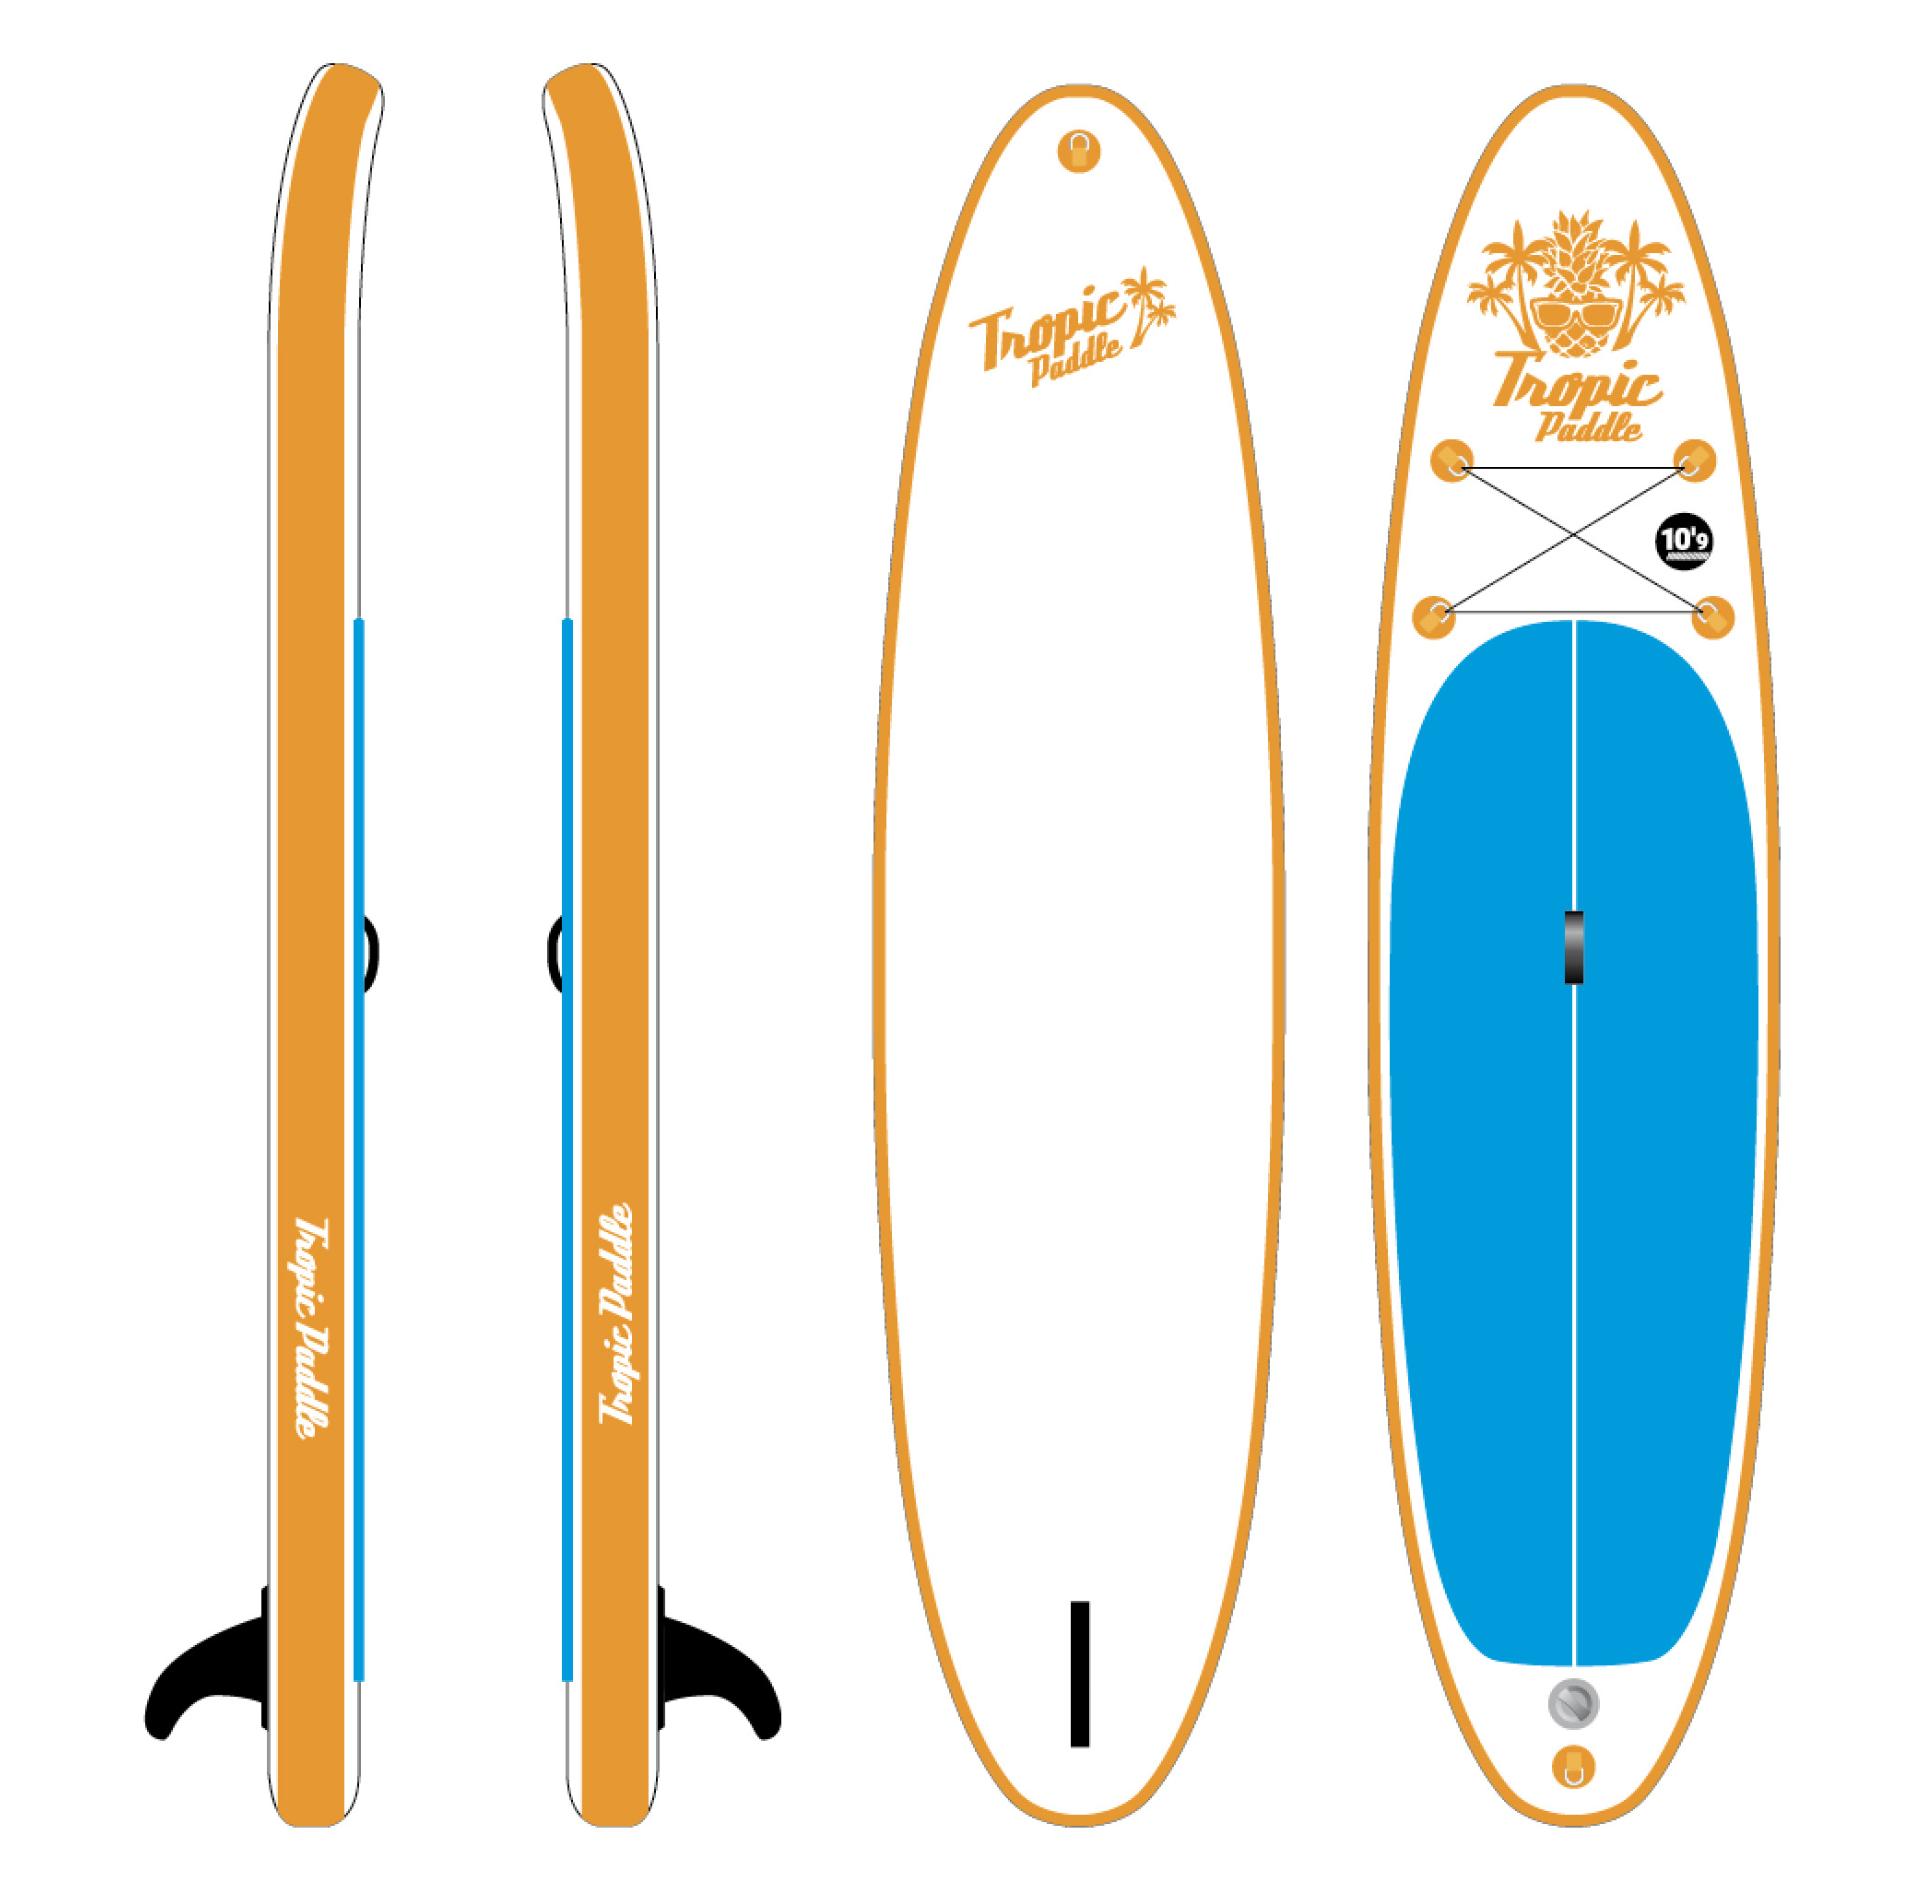 Tropic Paddle Pack 10.9 x 32